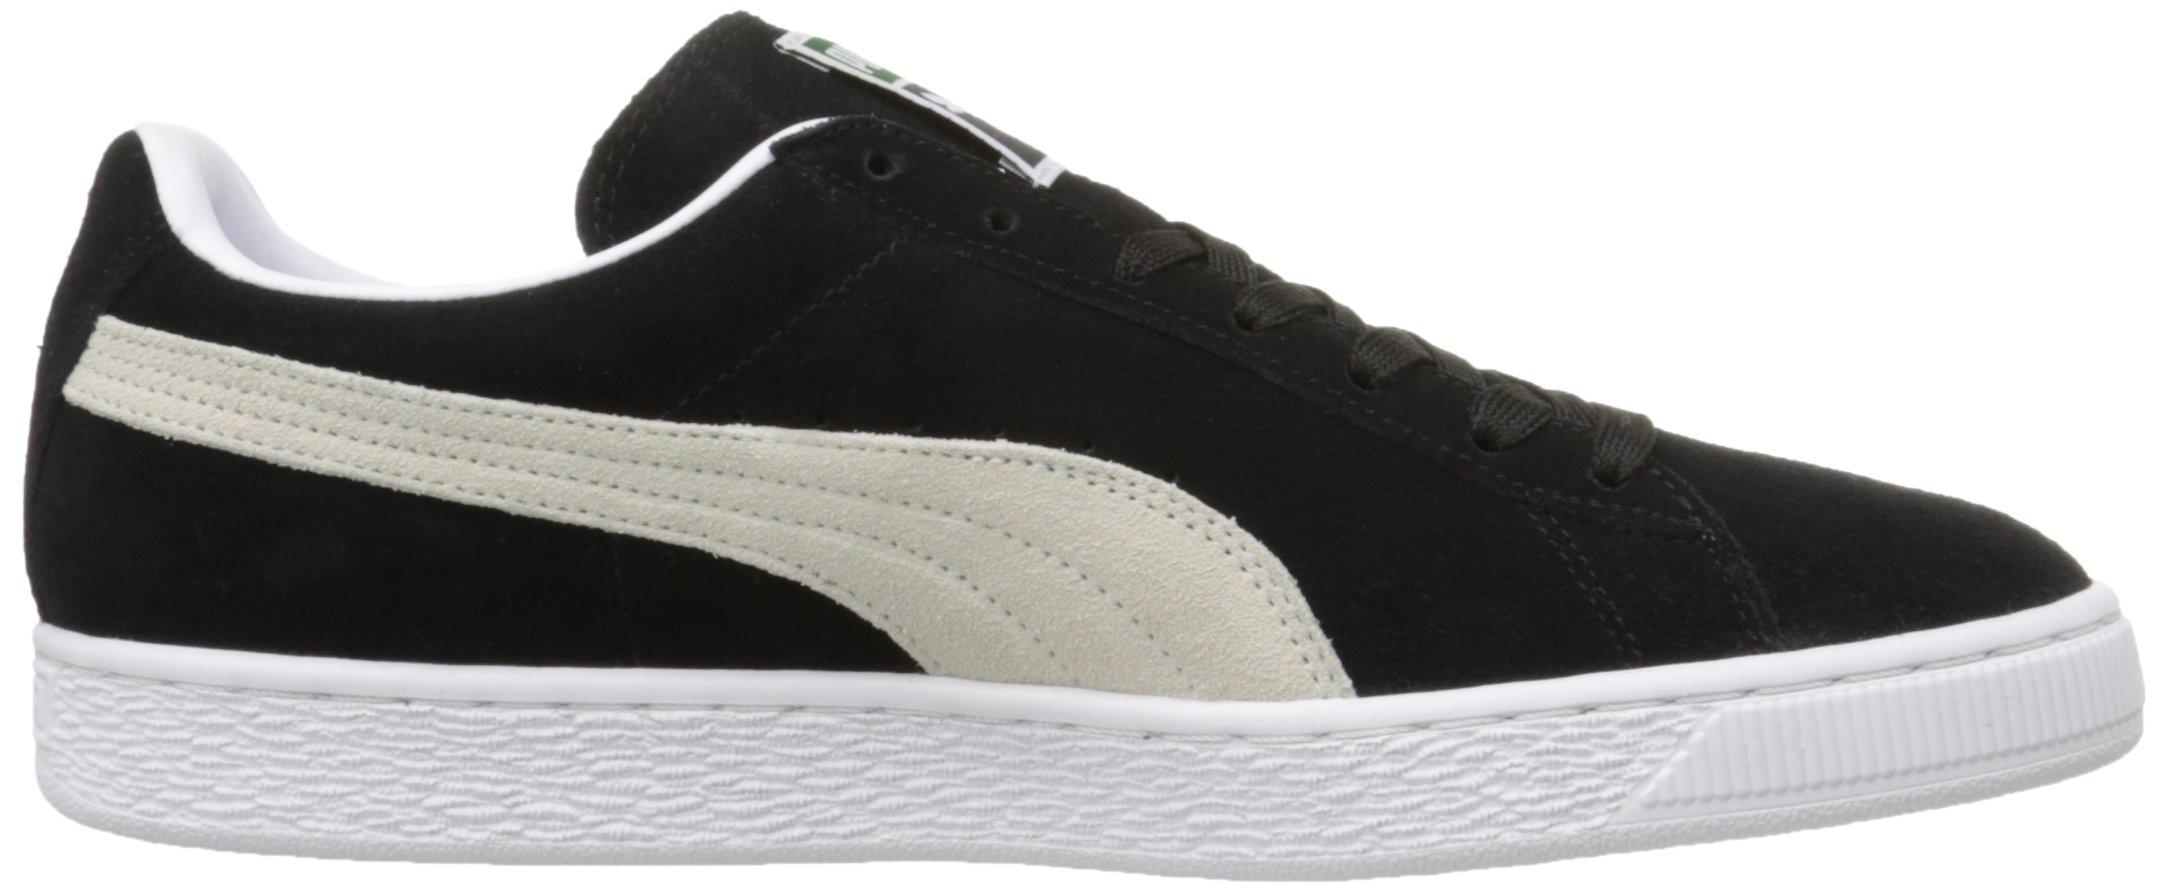 PUMA Suede Classic Sneaker,Black/White,9.5 M US Men's by PUMA (Image #12)